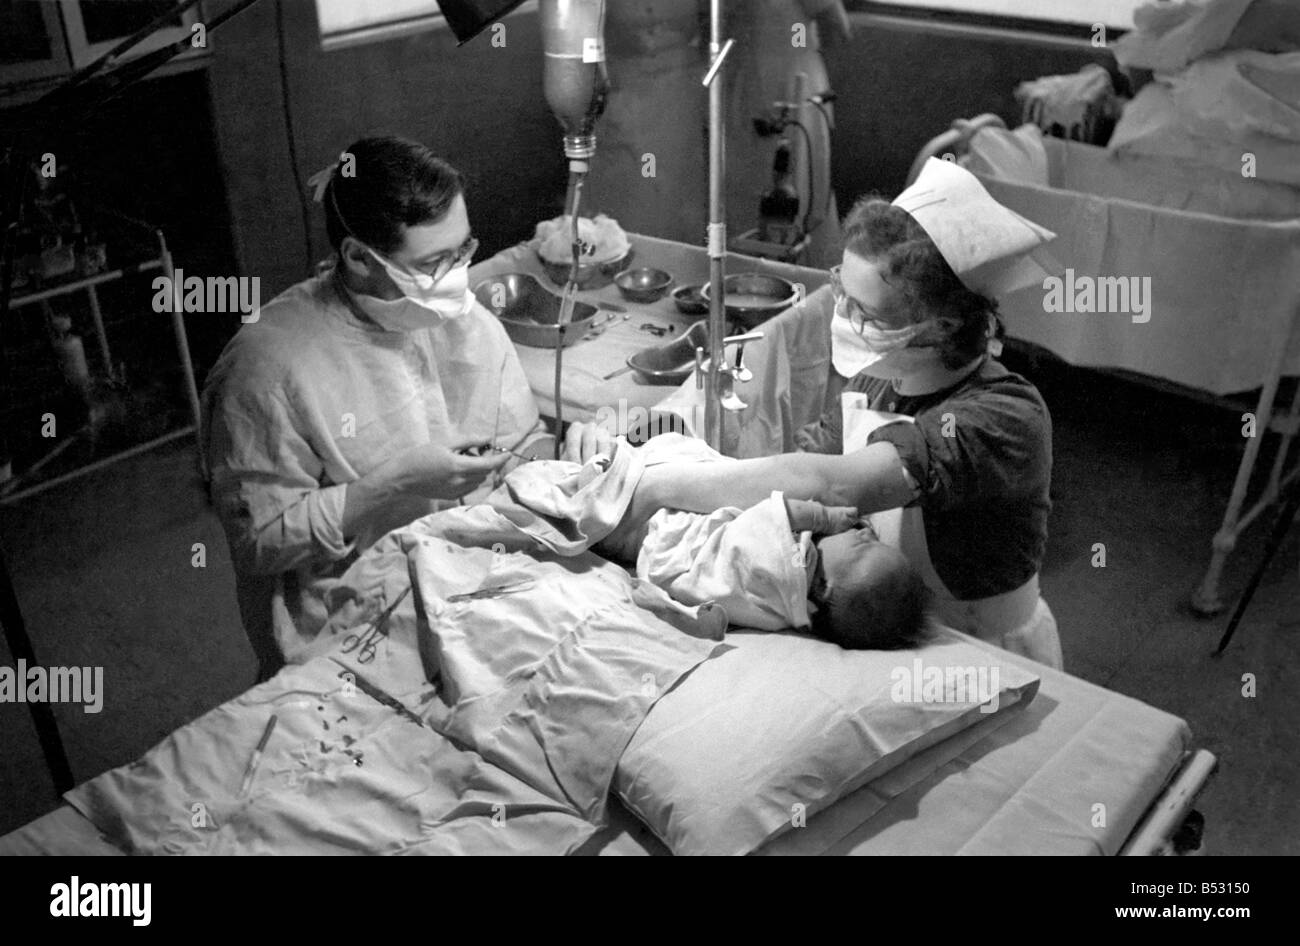 Hospital operation hearts. Babys life saved by blood transfusion.October 1946 O5112-002 - Stock Image